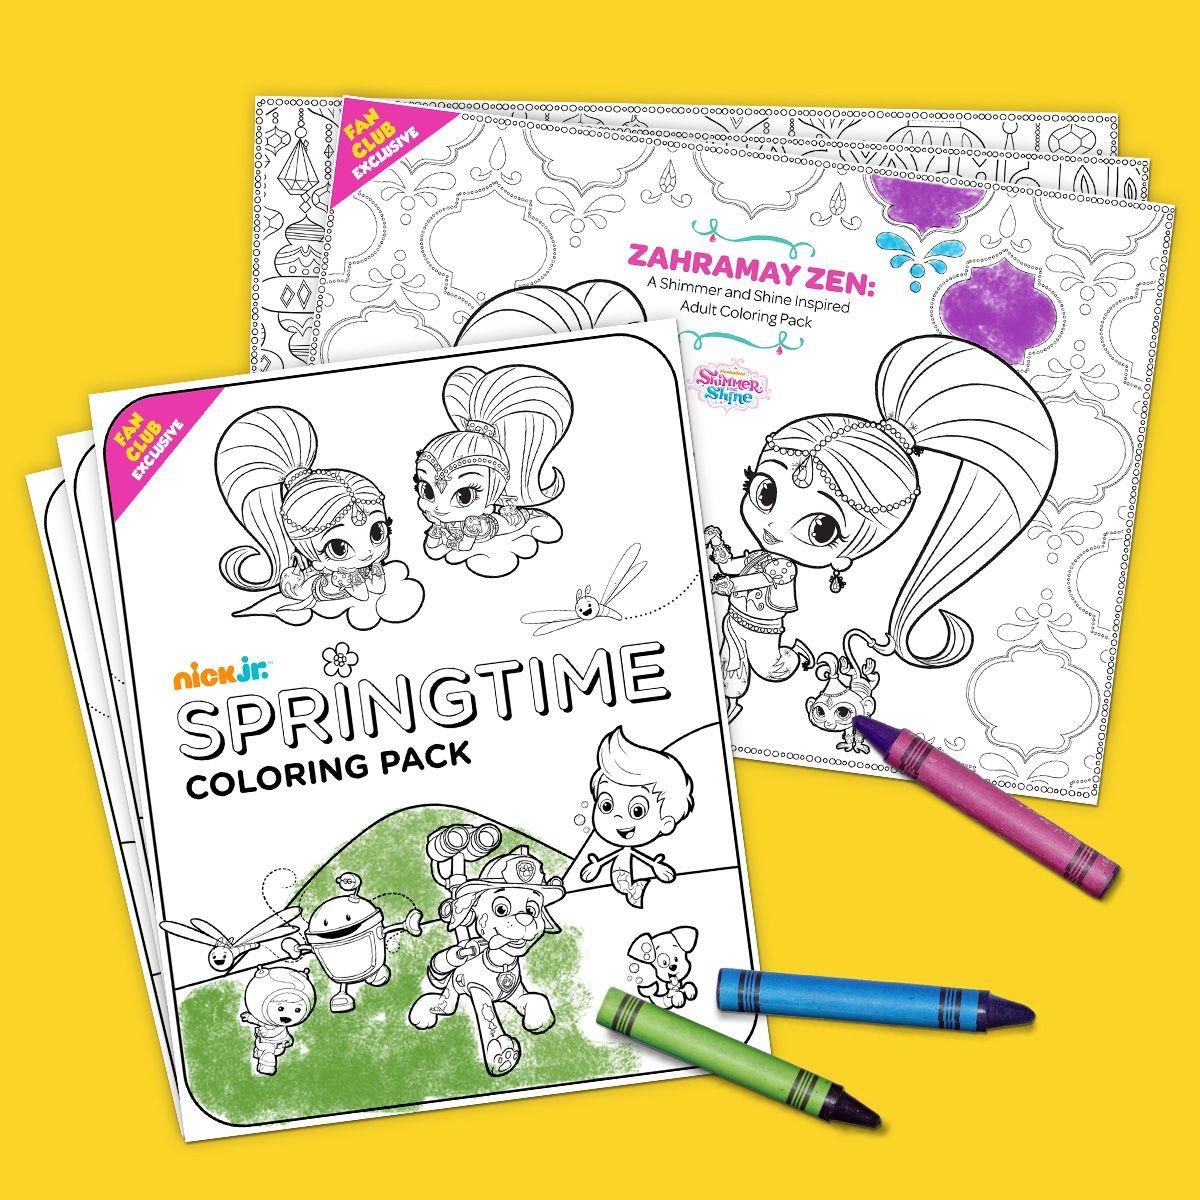 Fan Club Exclusive Springtime Coloring Pack | Mandalas y Dibujo